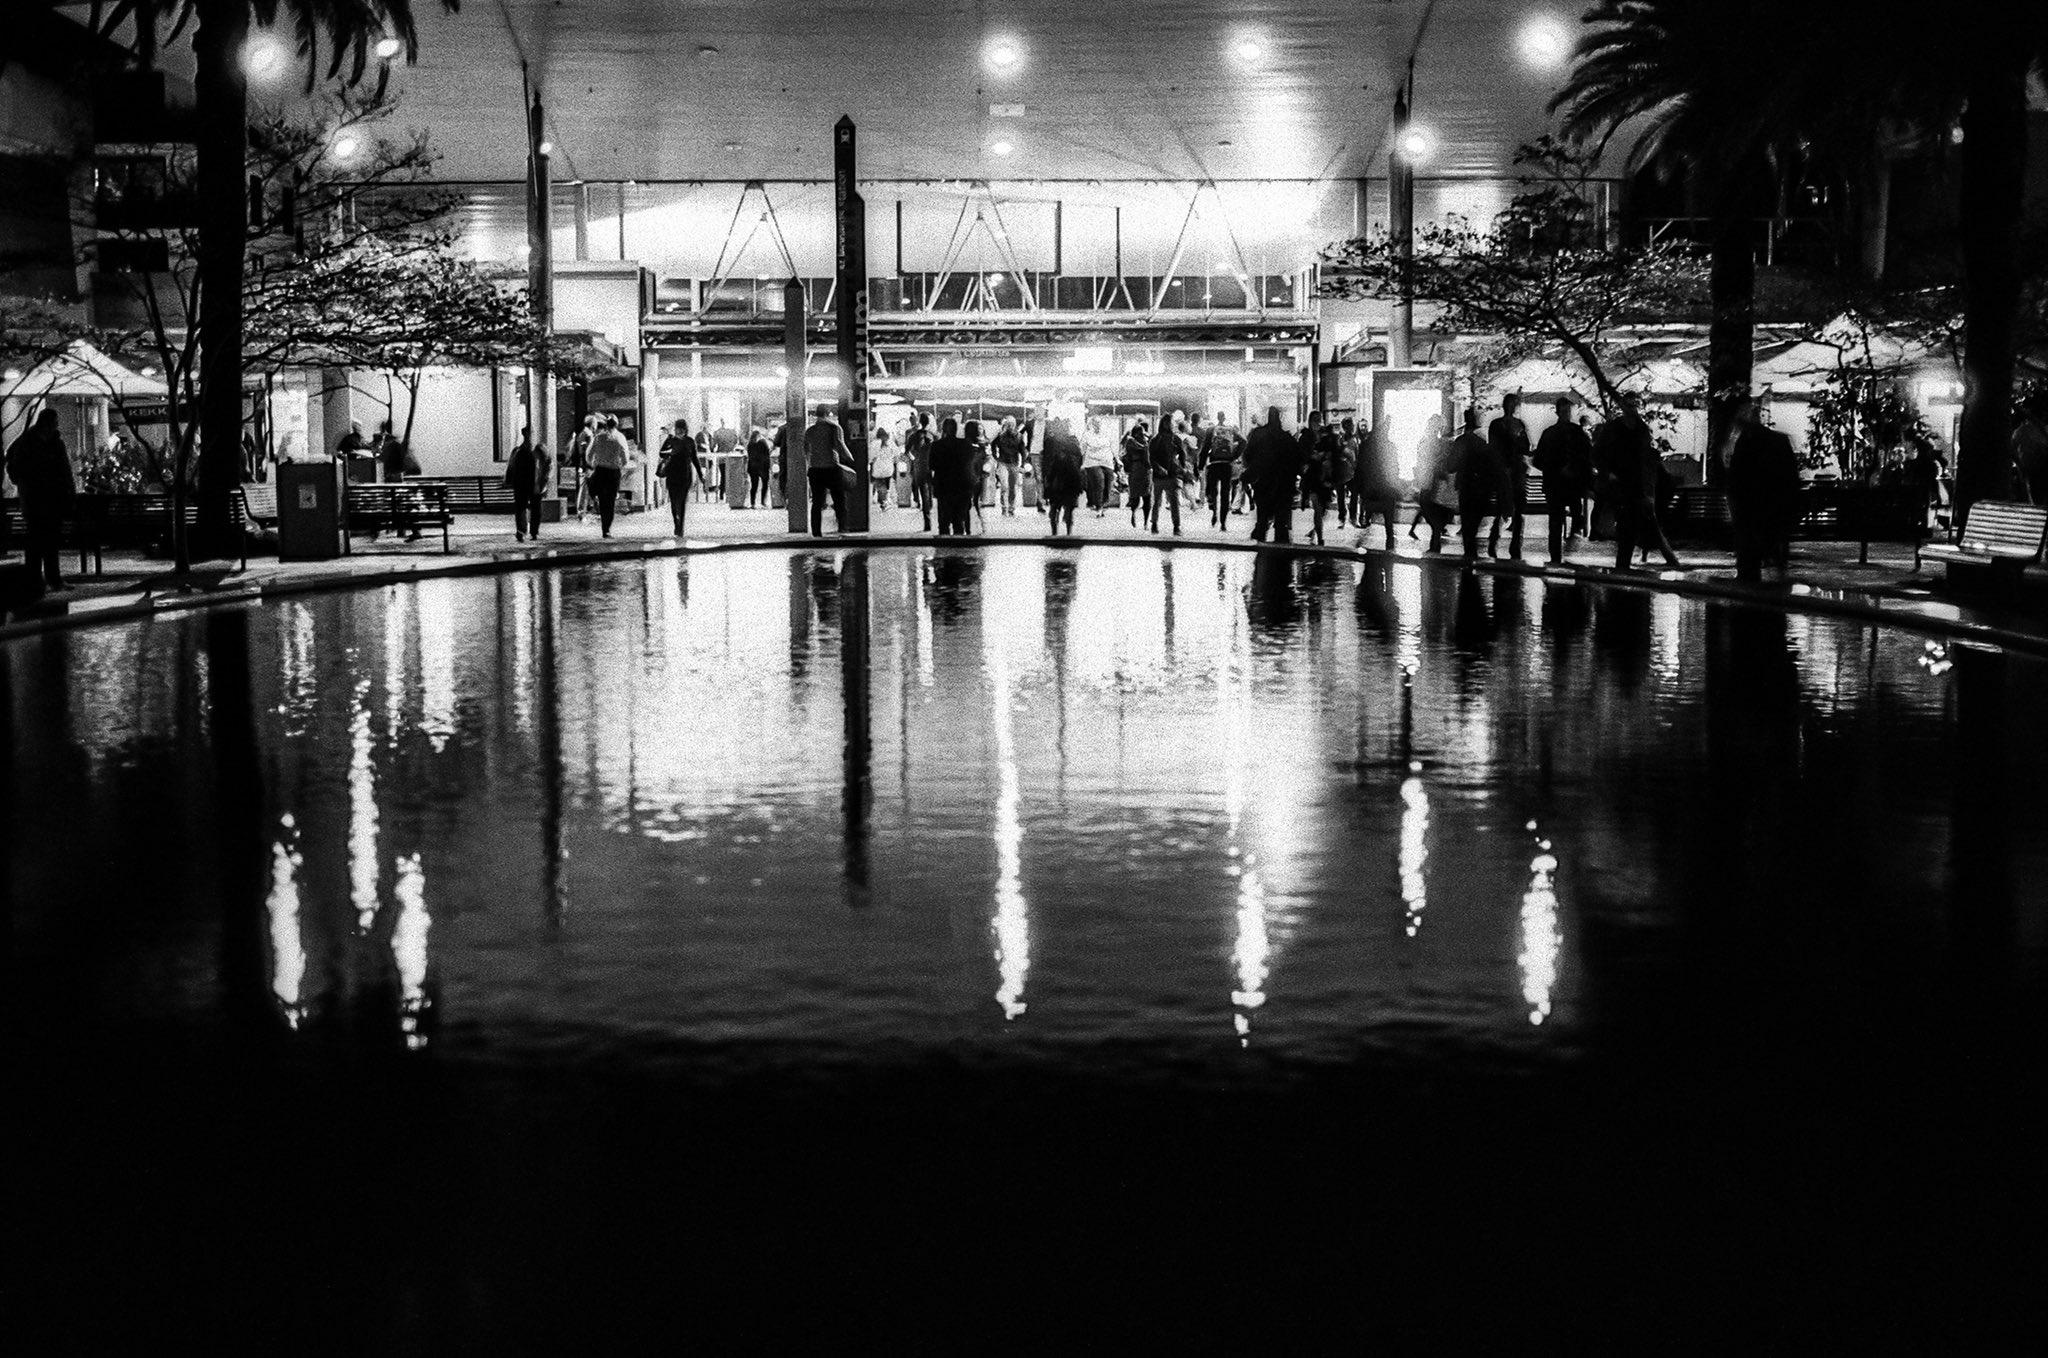 @billthoo Replying to @ILFORDPhoto Still one of my favourites Sydney May 2018 M4 + 50/2 #FP4 #ilfordphoto #fridayfavourites #35mmfp4